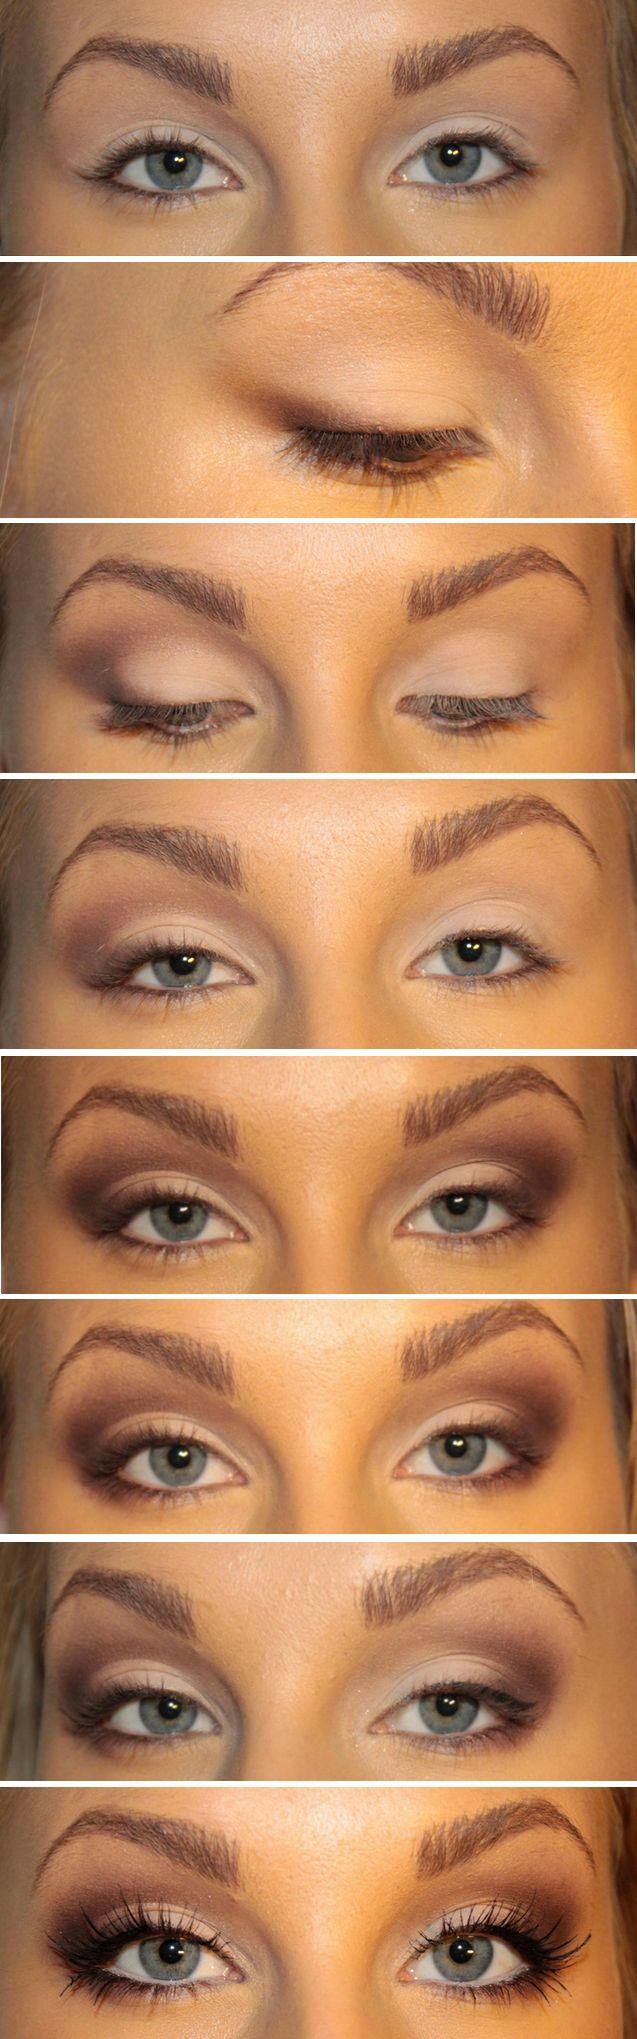 Bigger eyes makeup tutorial even tho her face is orange as a mug